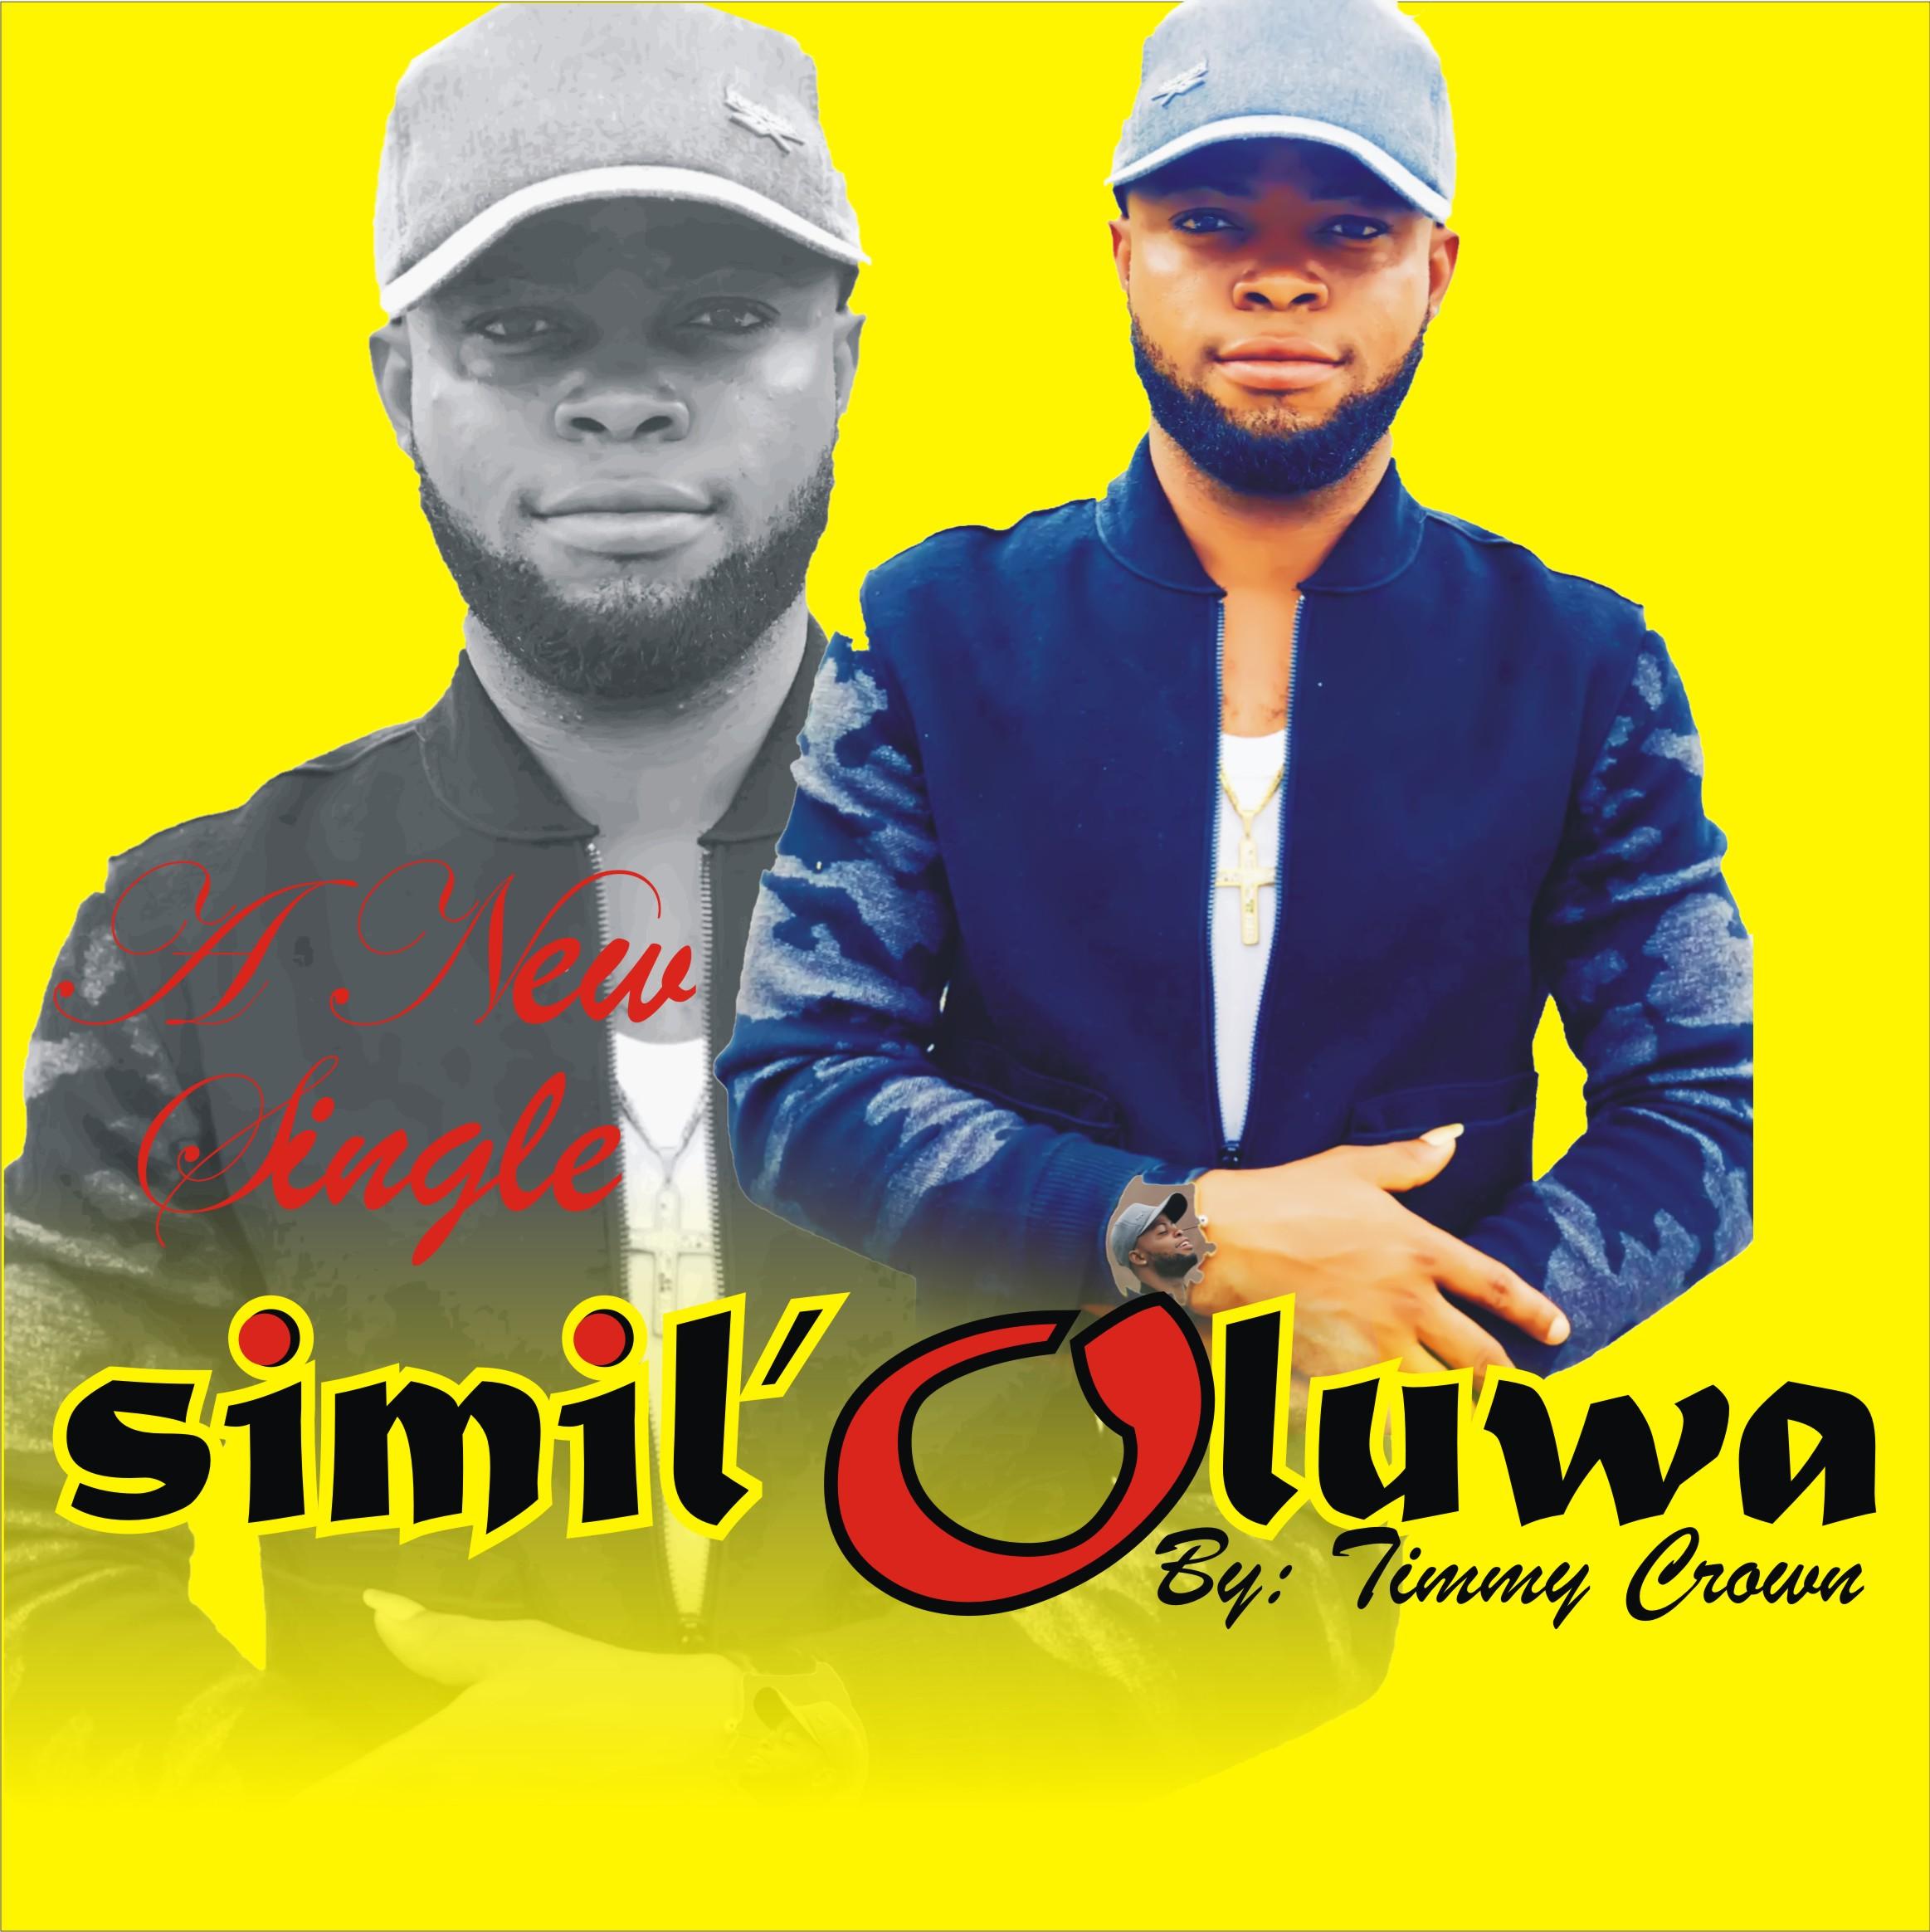 Timmy-Crown-Simil'Oluwa-mp3-download-Teelamford